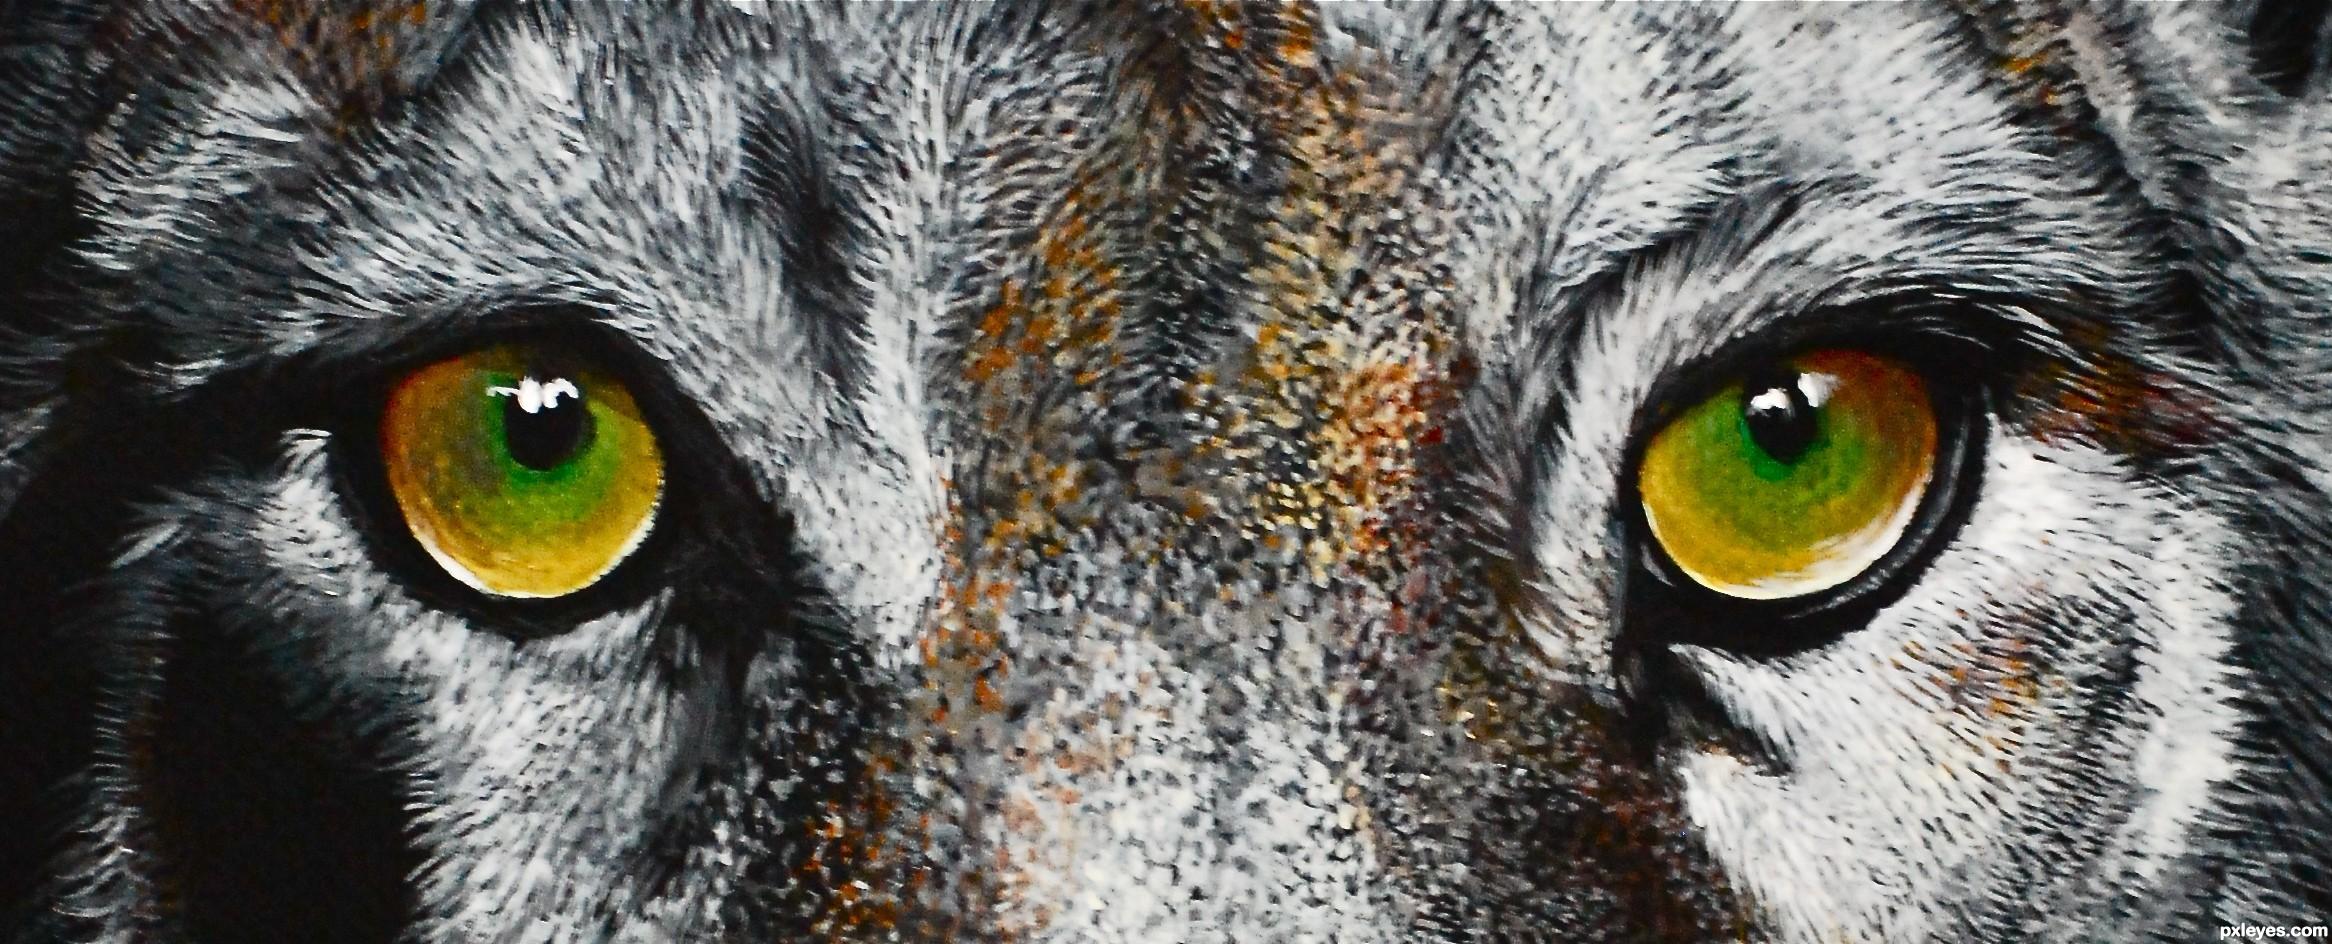 animal eyes wild eye animals drawing drawings draw google pxleyes hi res vision score views contest favs sbs rank